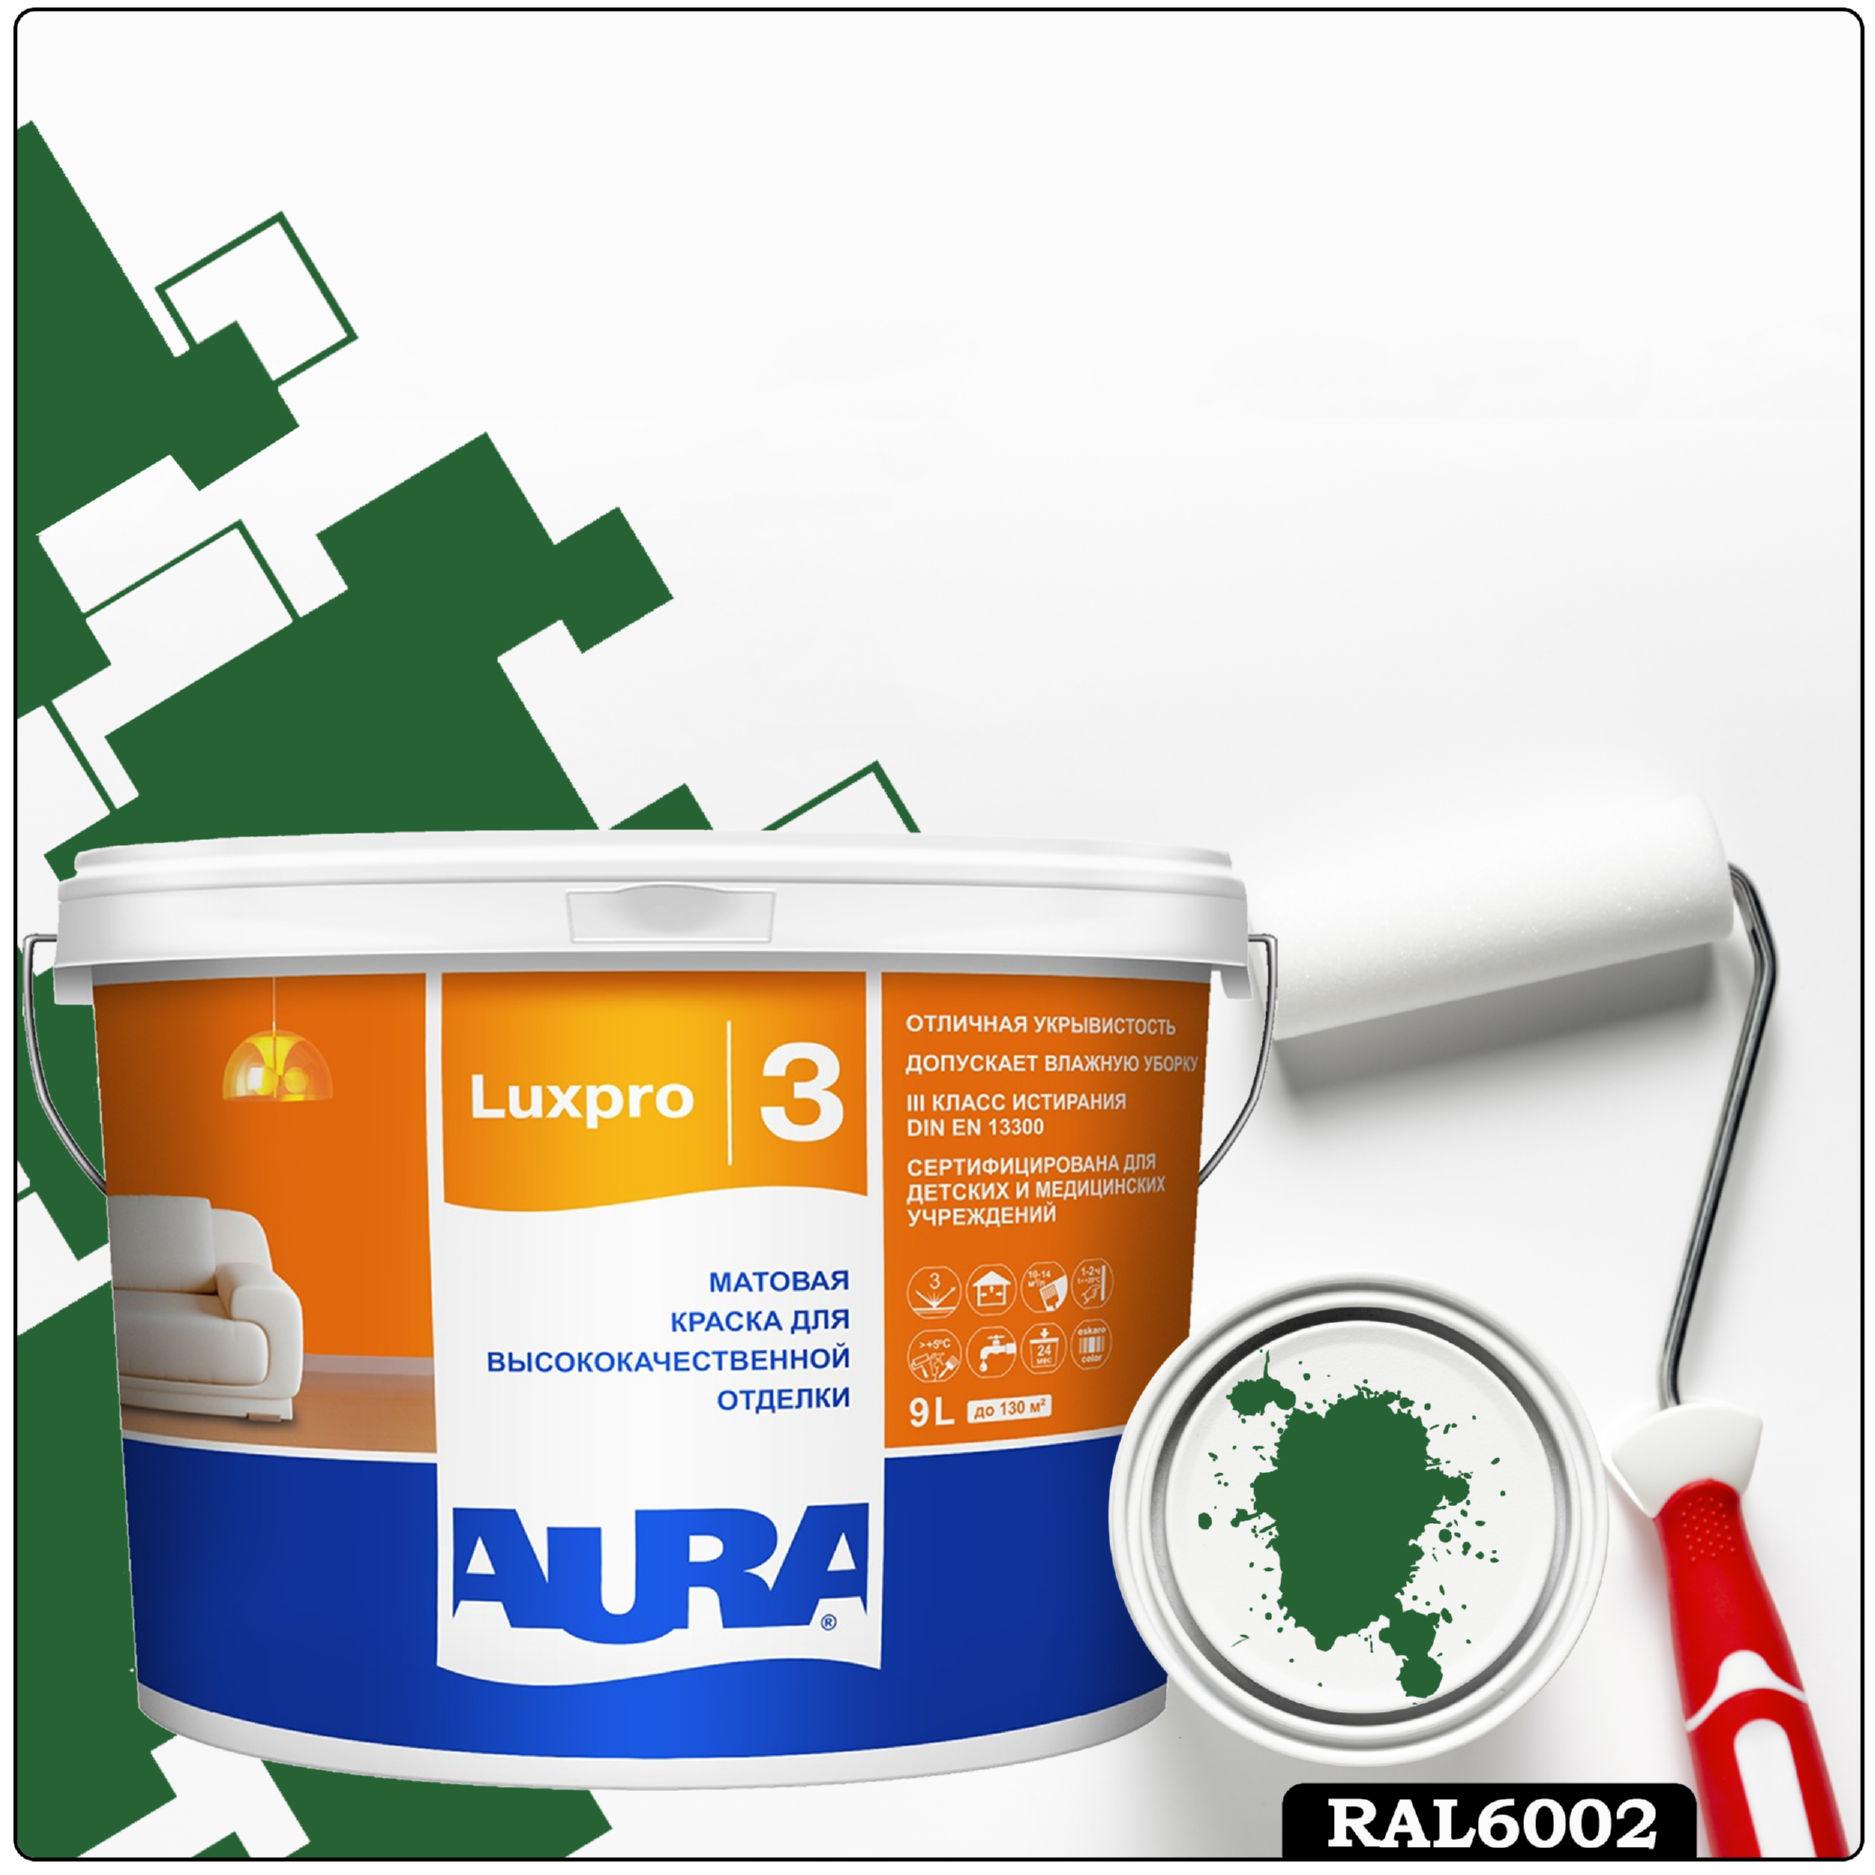 Фото 3 - Краска Aura LuxPRO 3, RAL 6002 Зеленый лист, латексная, шелково-матовая, интерьерная, 9л, Аура.